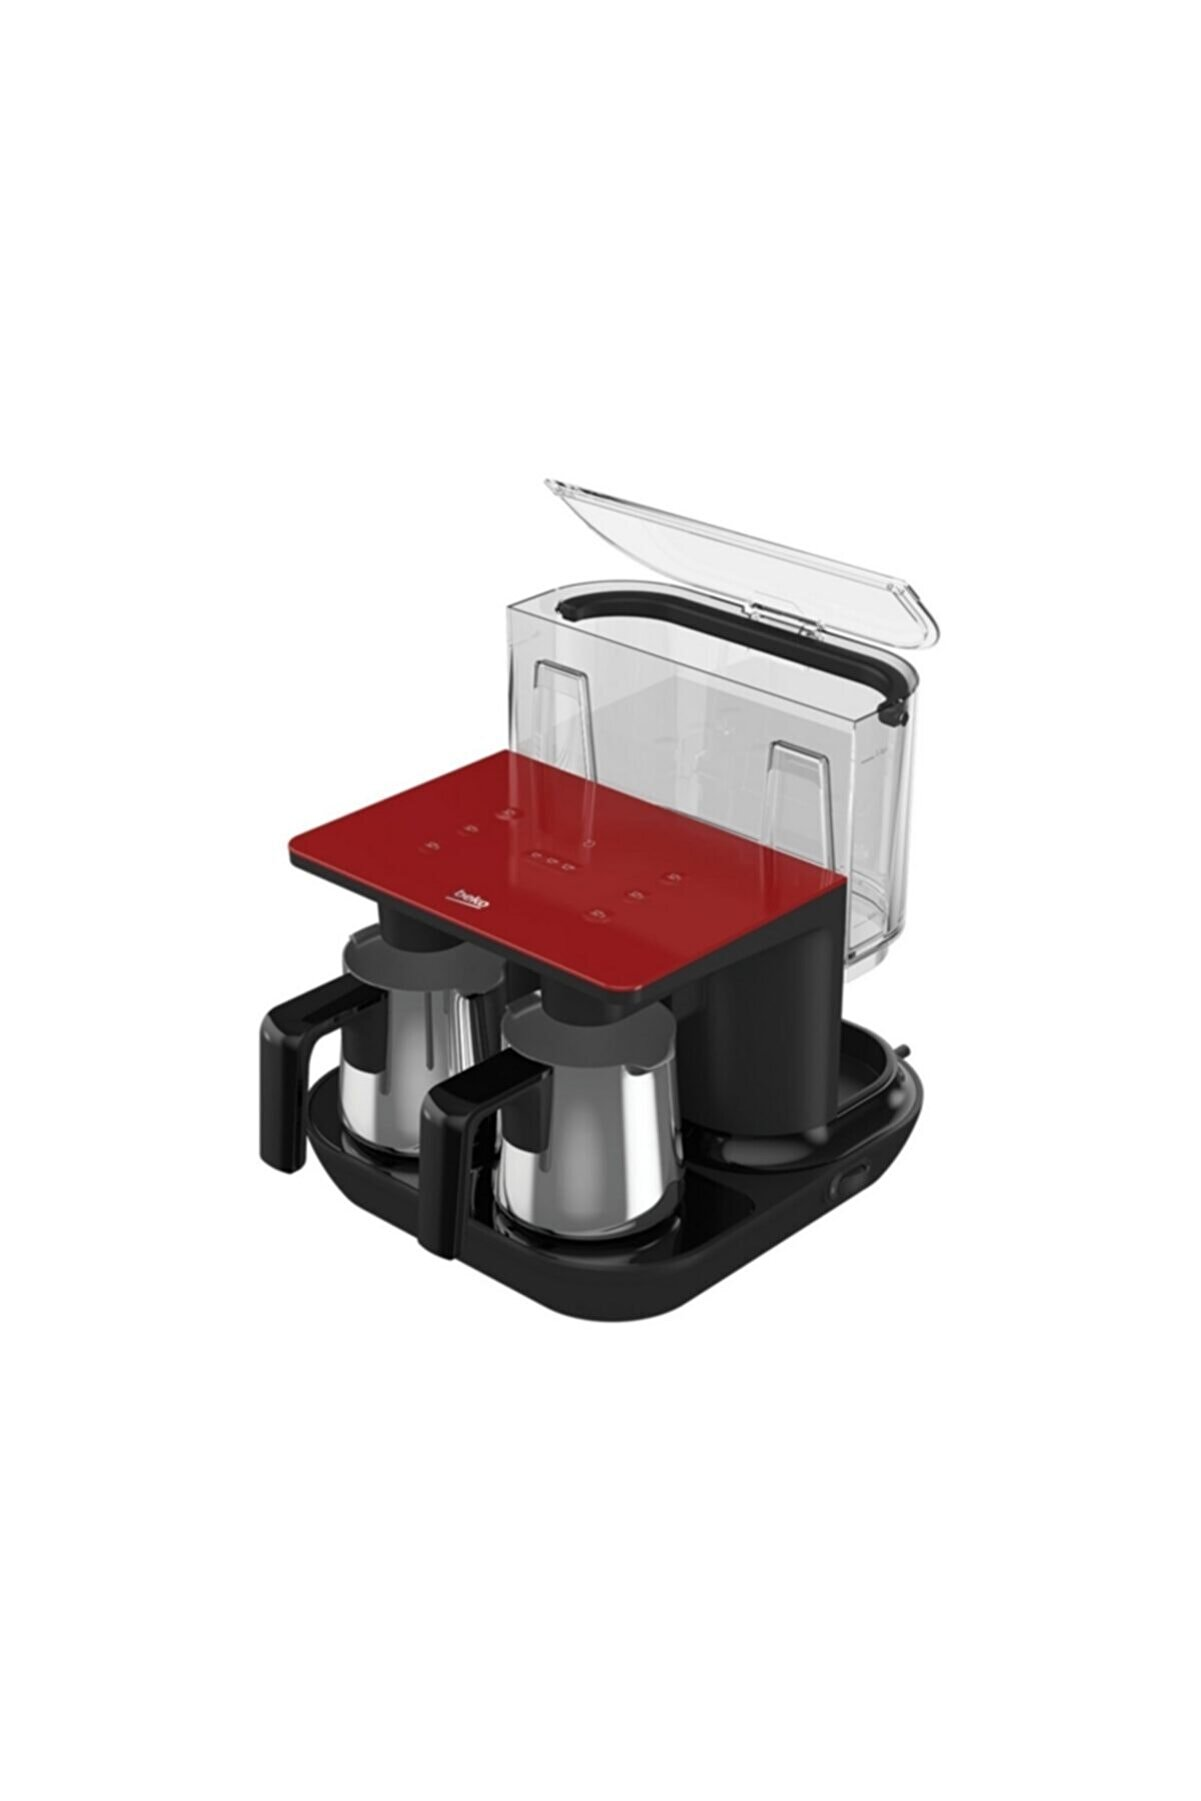 Beko Tkm 8961 K Keyf Kırmızı Türk Kahve Makinesi